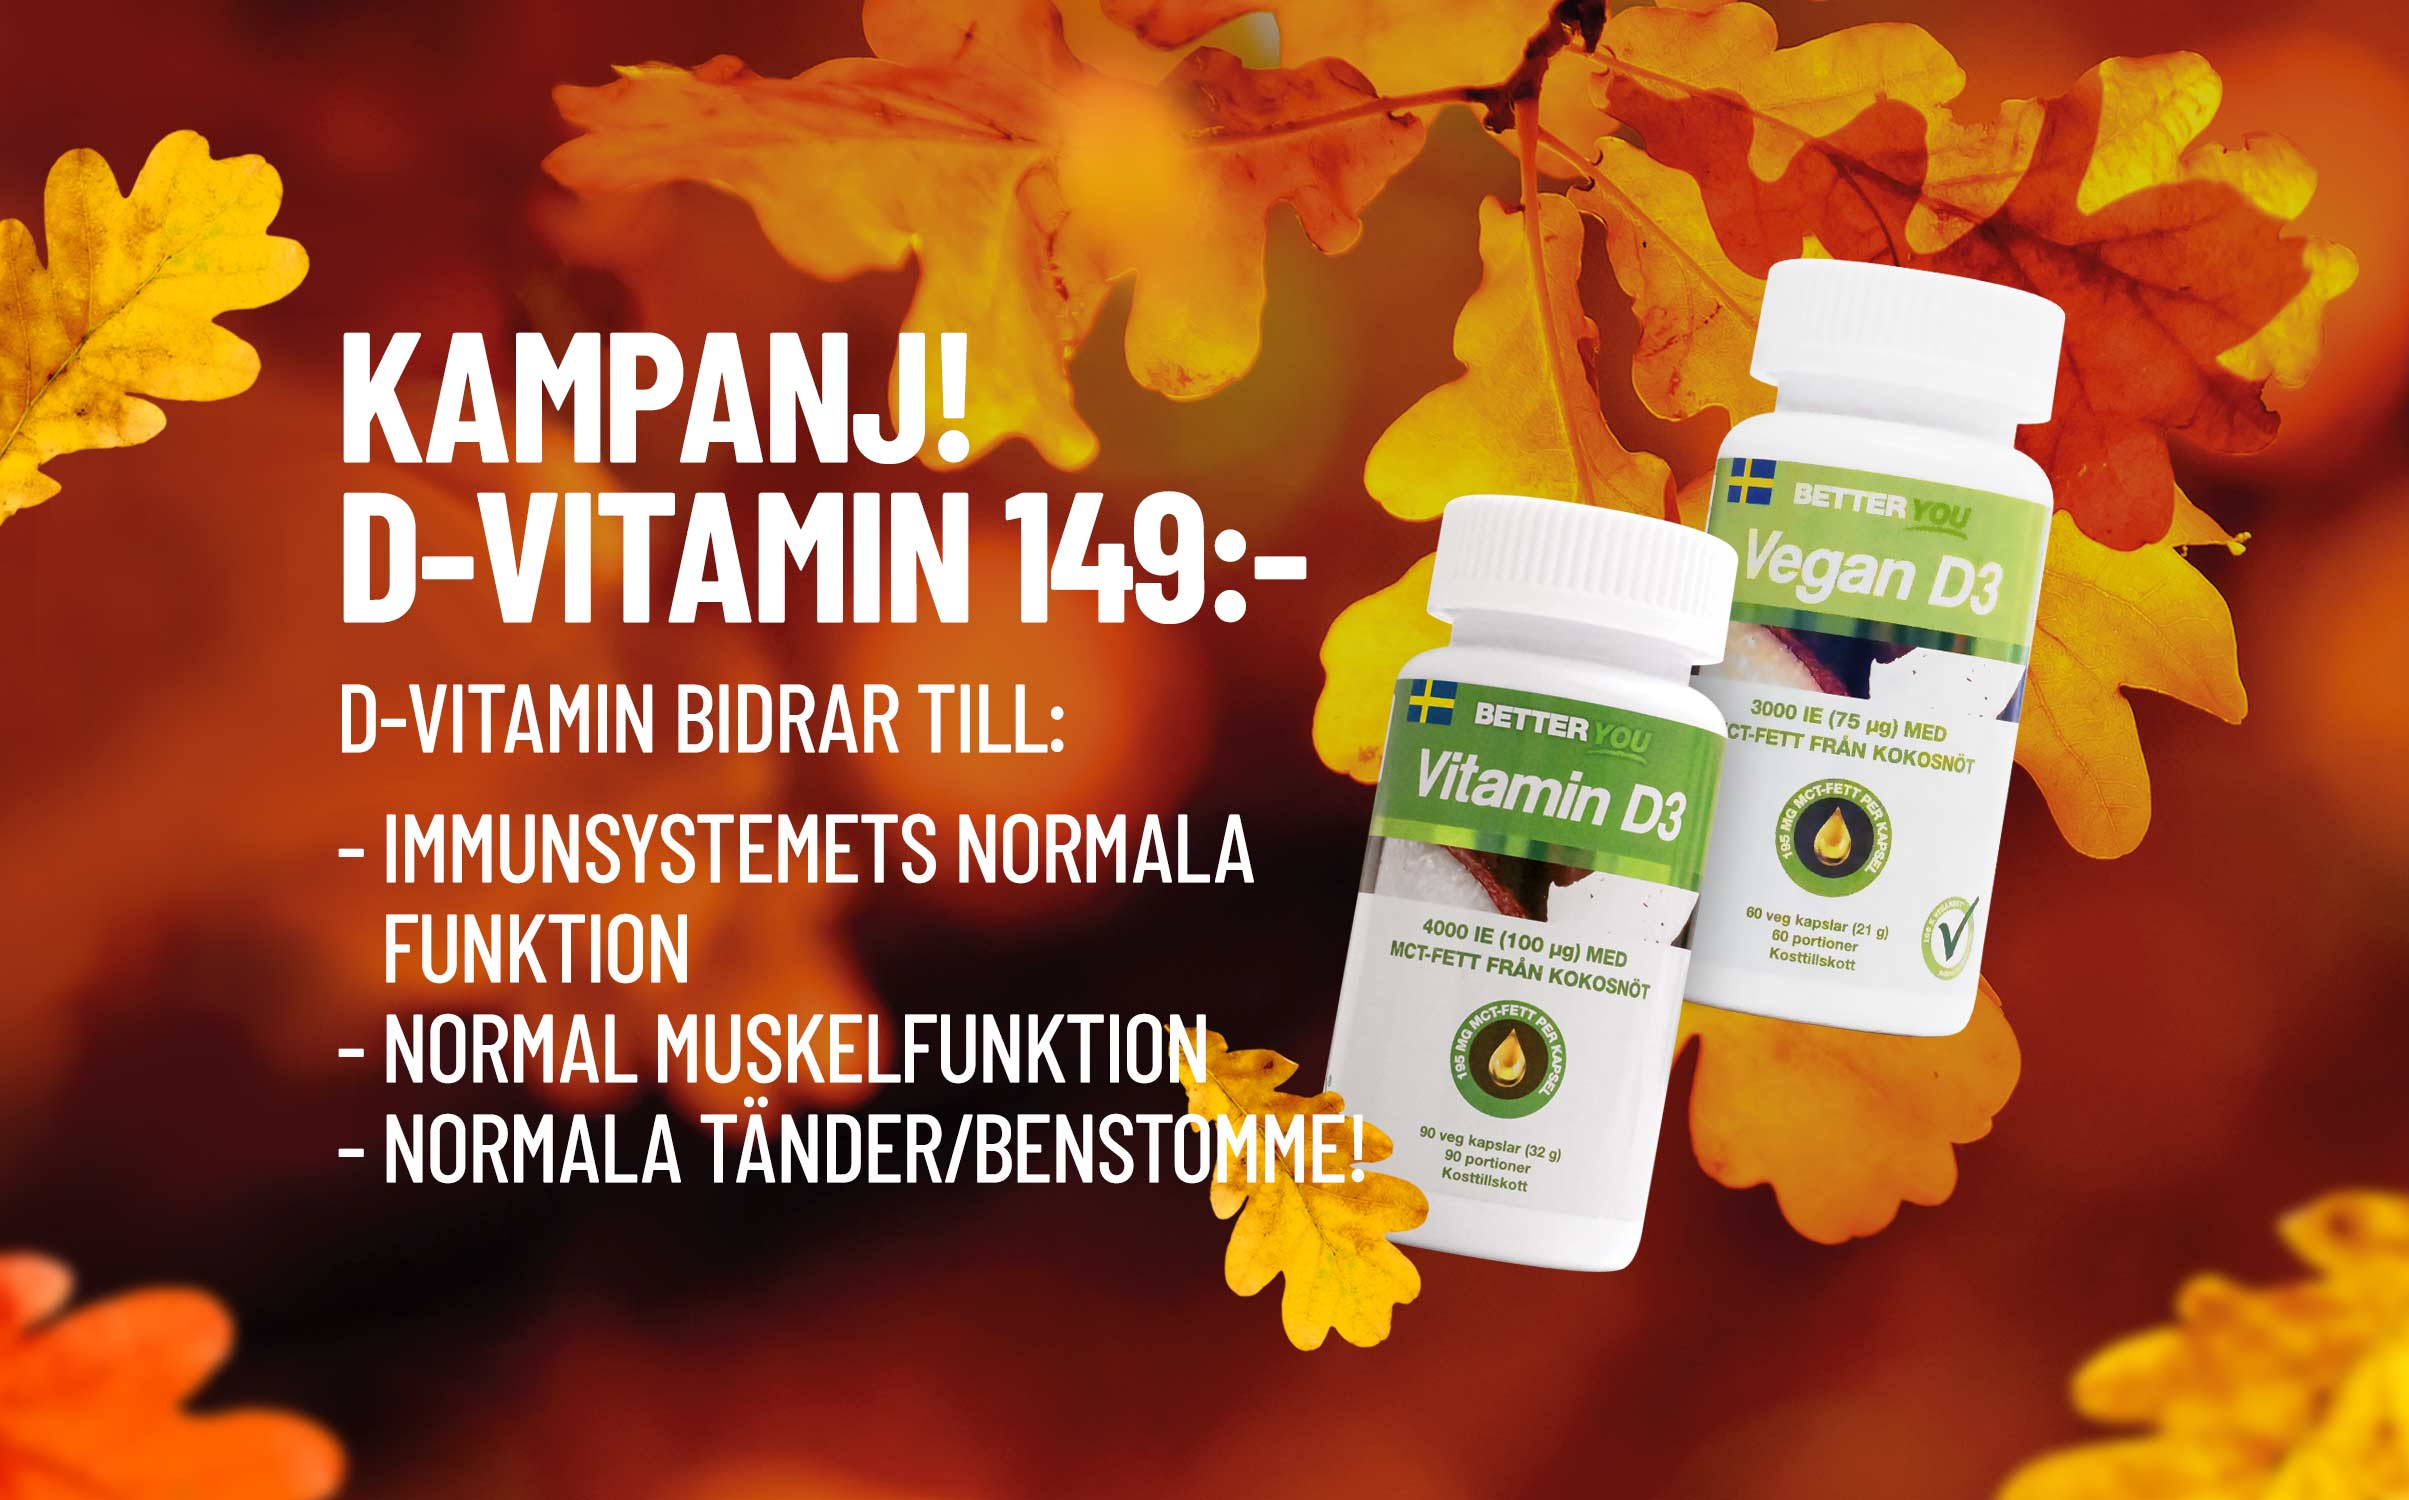 https://www.betteryou.se/pub_docs/files/Custom_Item_Images/Stora_snurr_1_D-vitamin.jpg